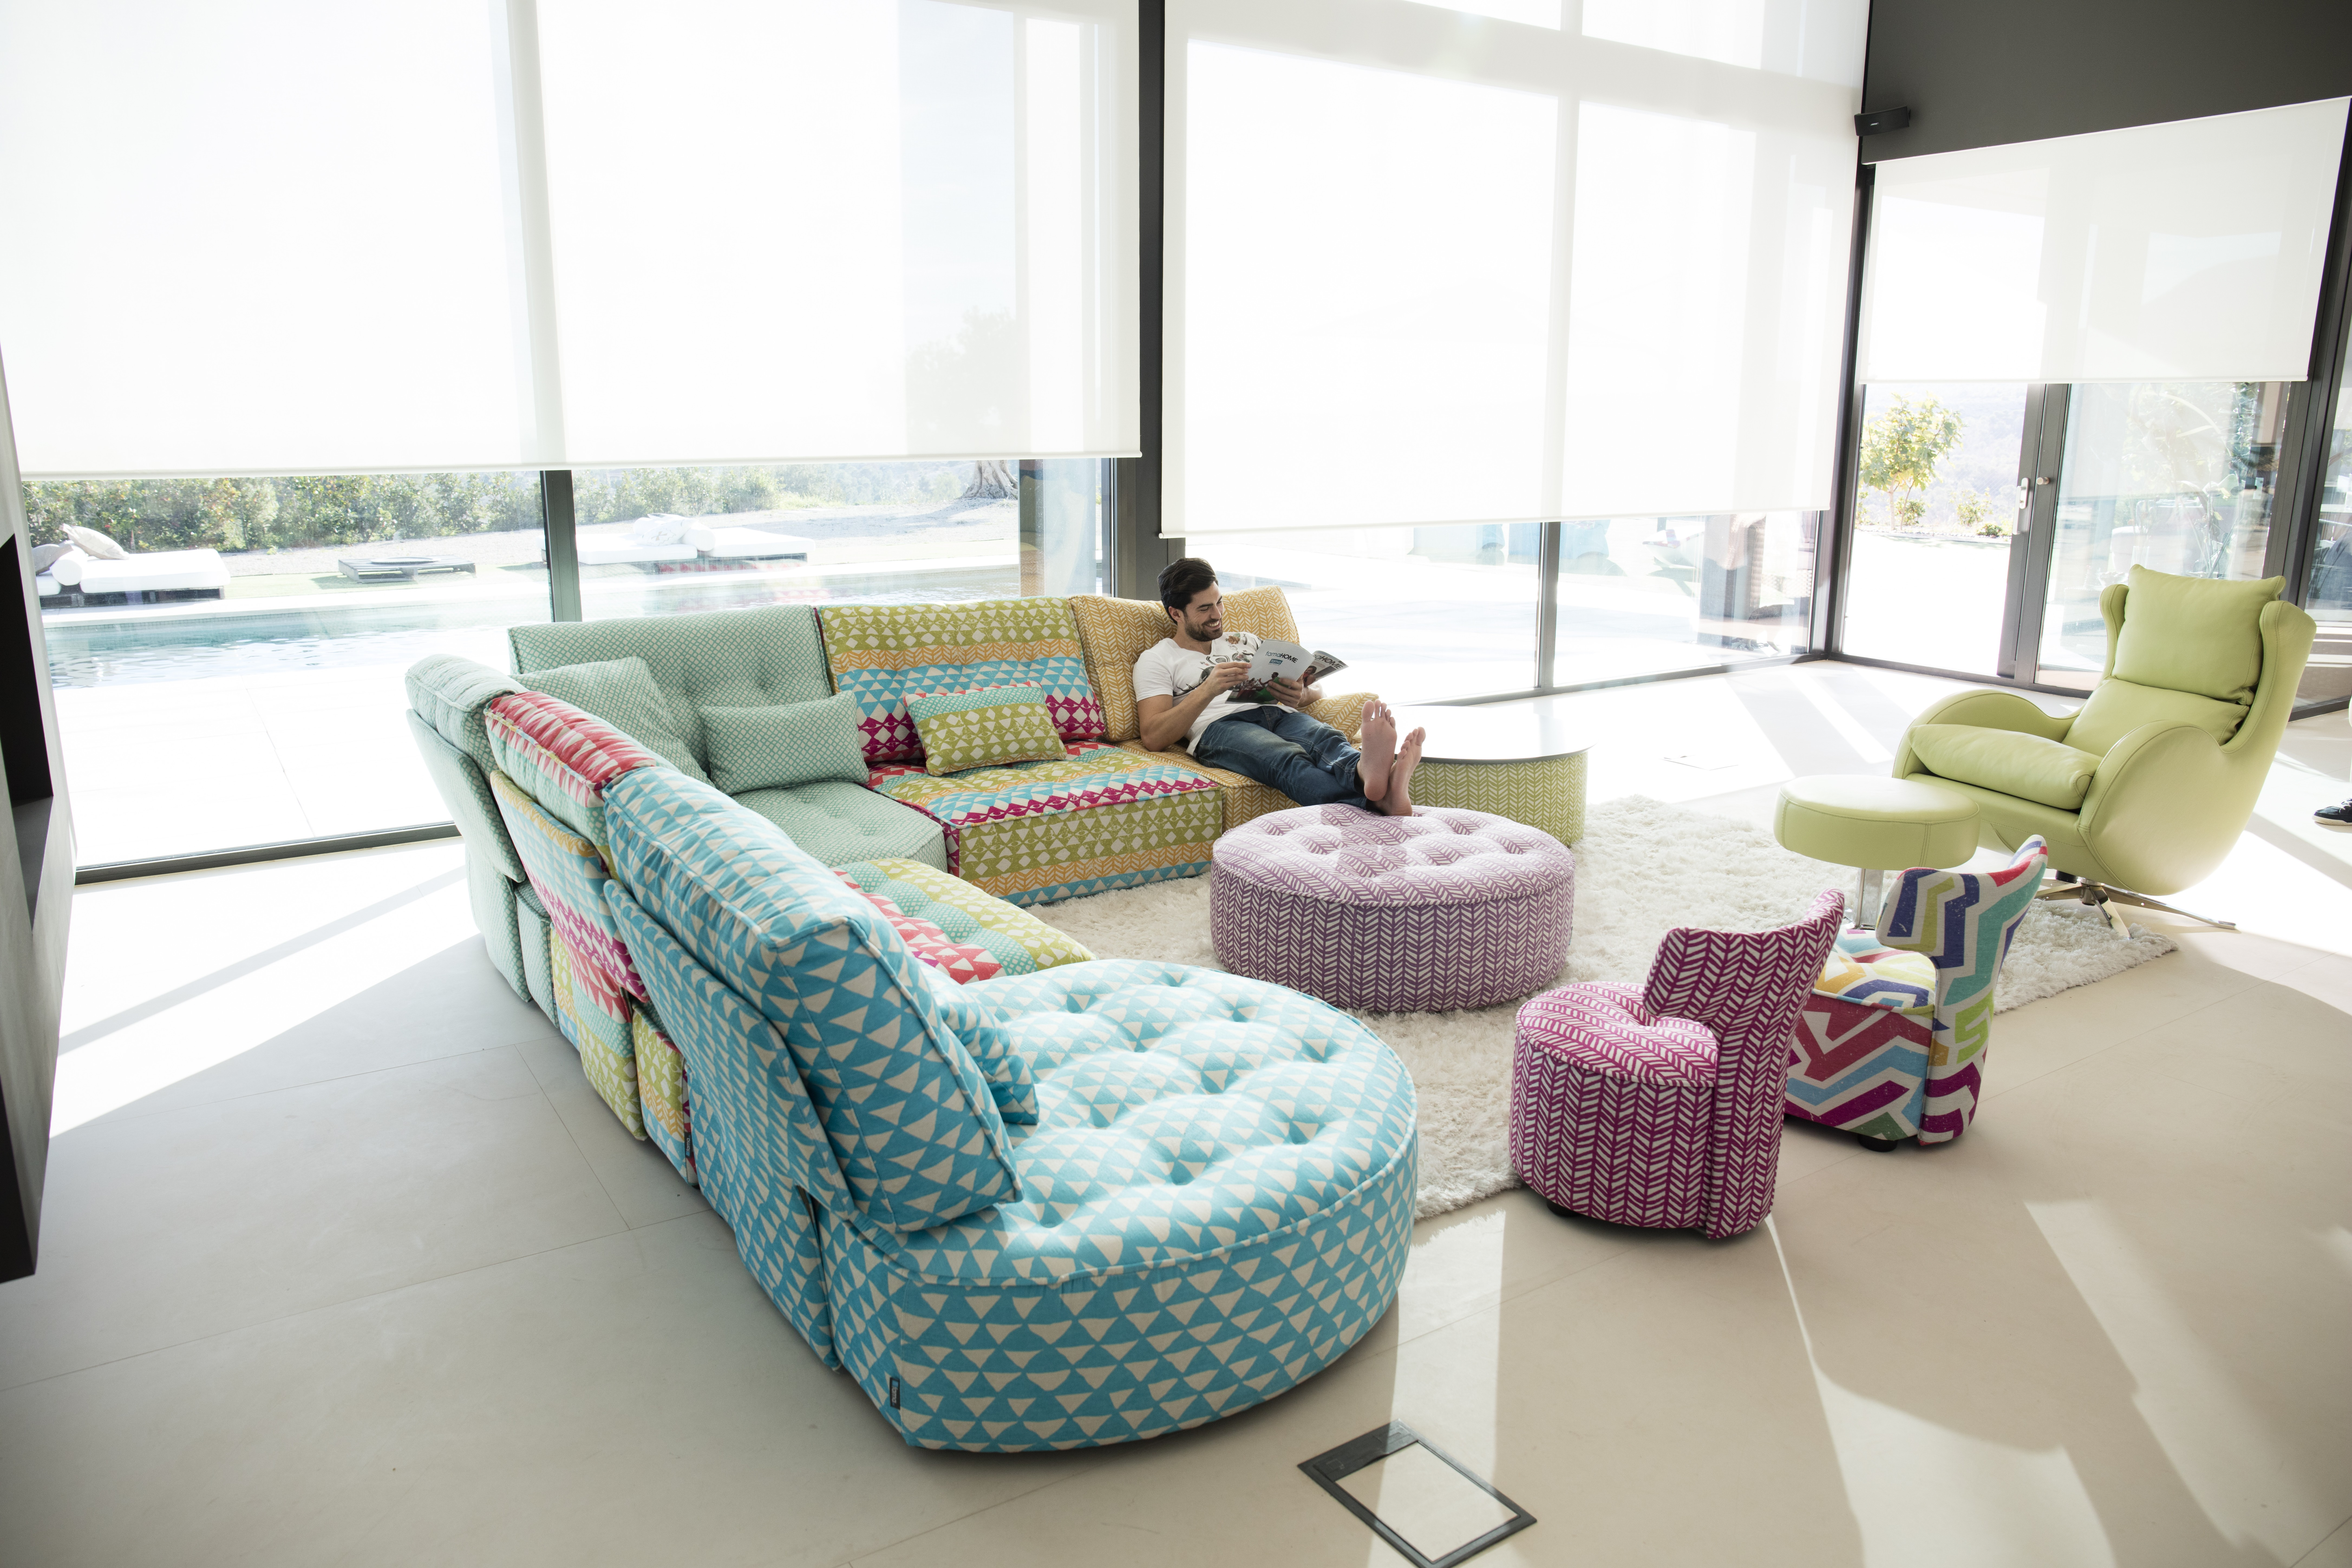 fama design rennes - meubles philippine - Meubles Design Rennes